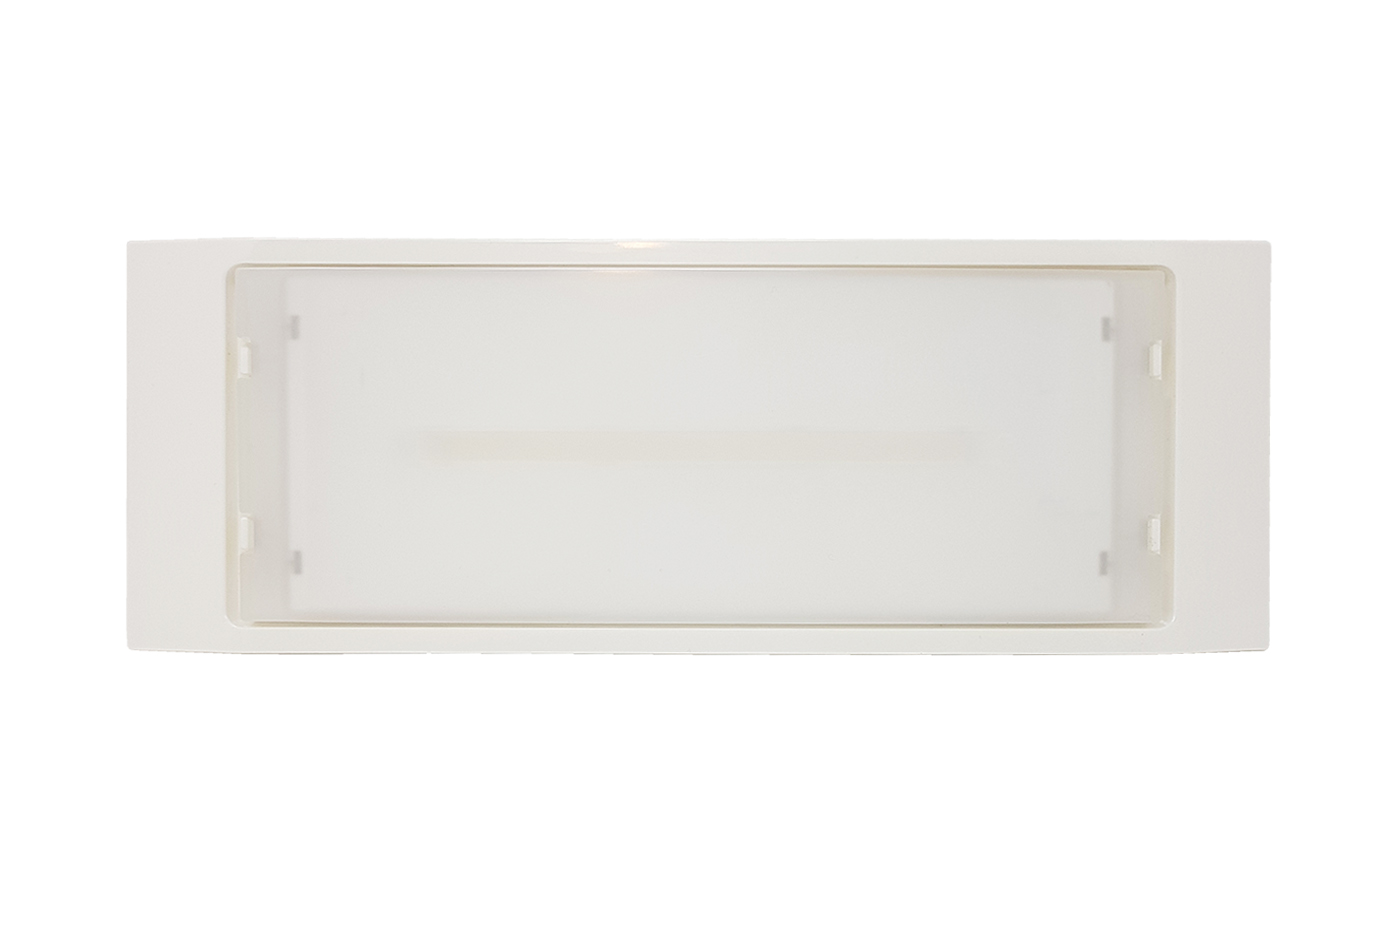 Plafoniere Con Luce Emergenza : Bes 23261 lampade emergenza beselettronica lampada plafoniera